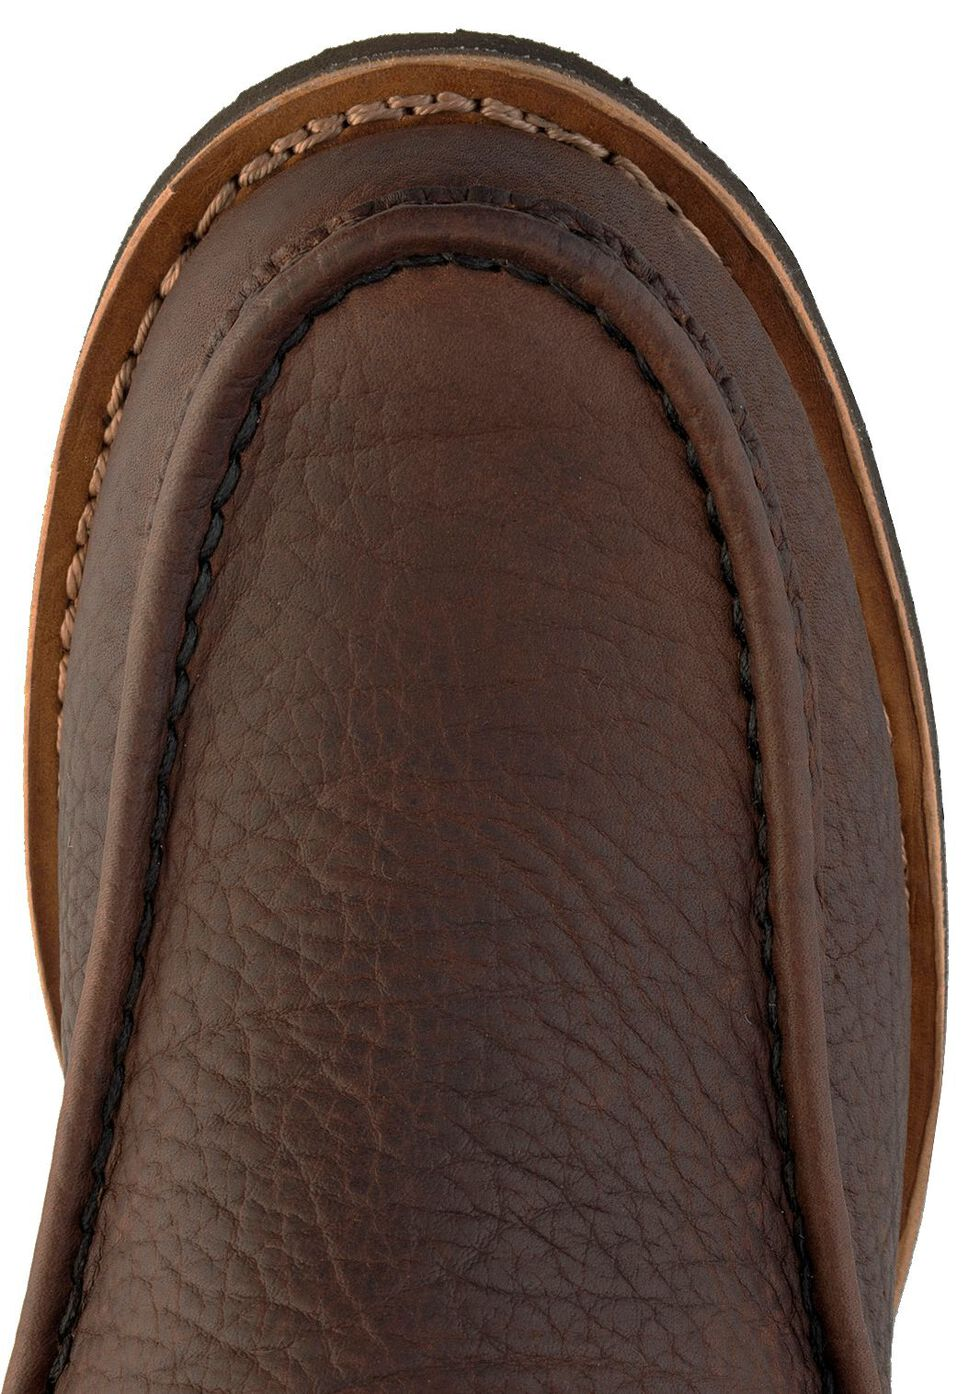 Chippewa Waterproof Bison Zip-up Harness Boots - Moc Toe, Briar, hi-res